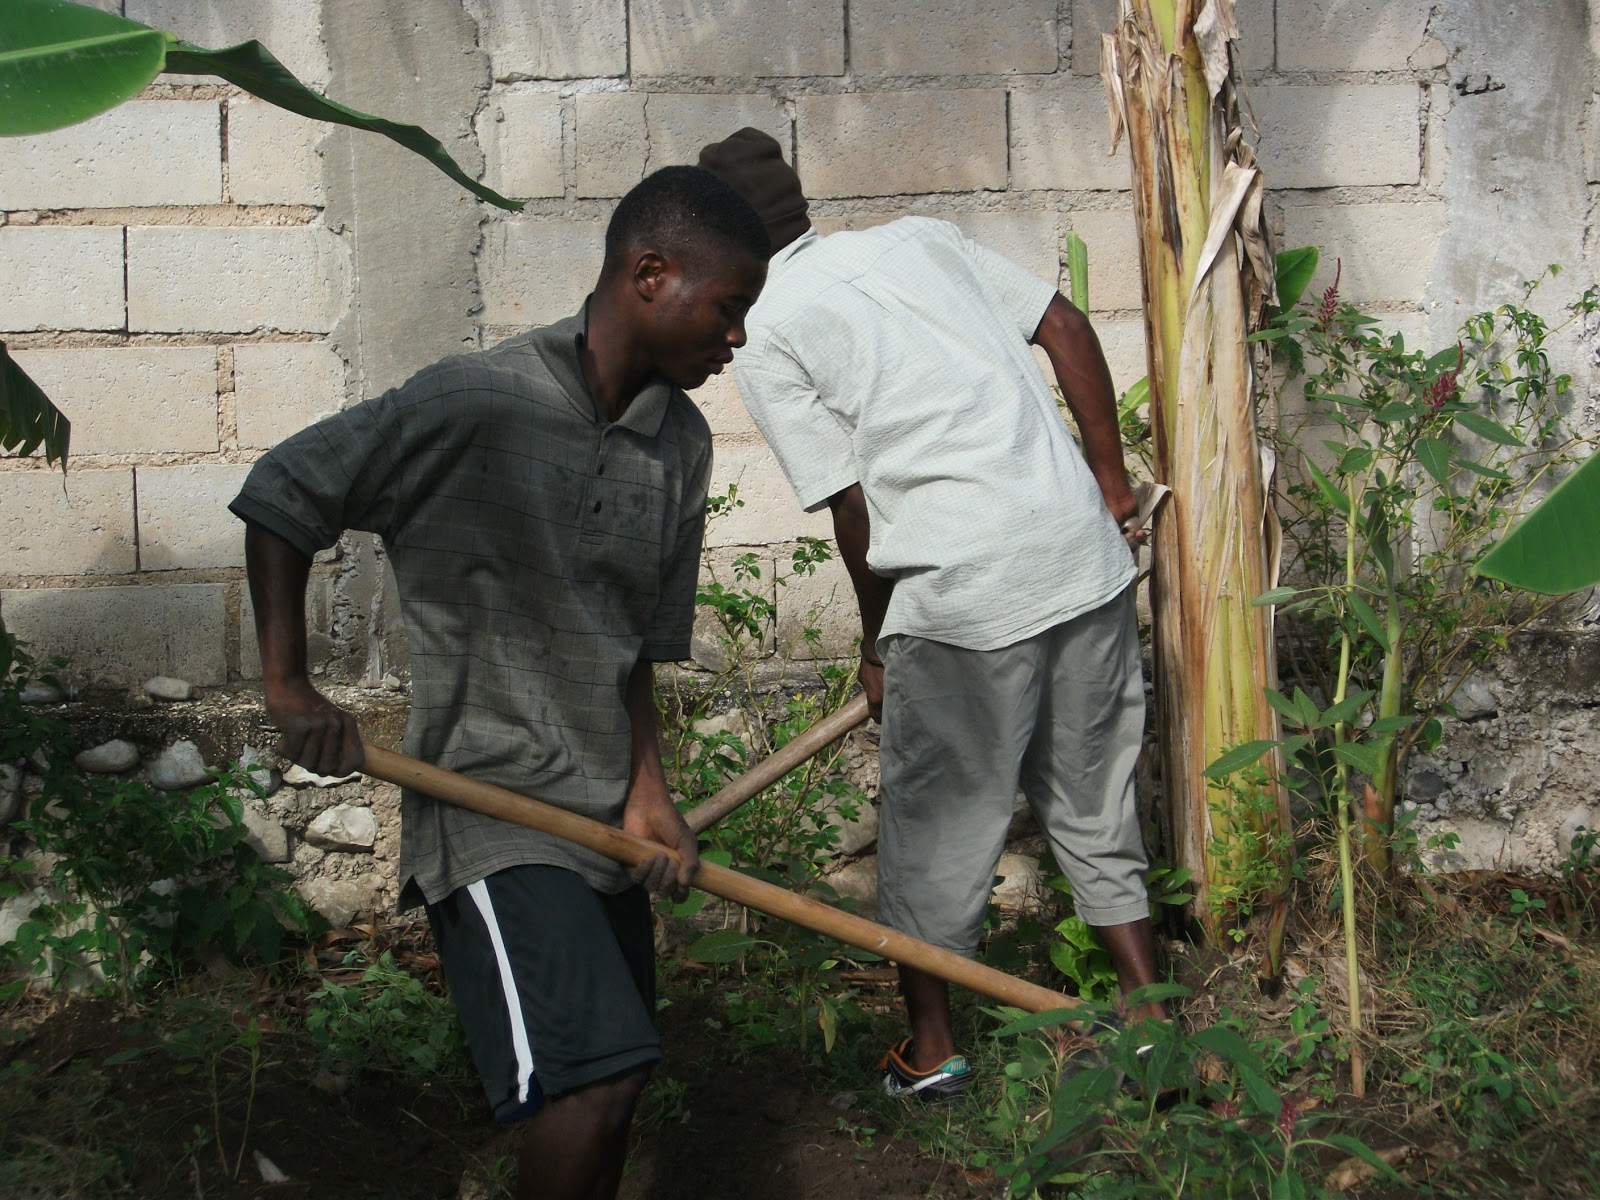 Action ha ti projets maryse novembre 2012 - Nettoyage du jardin ...